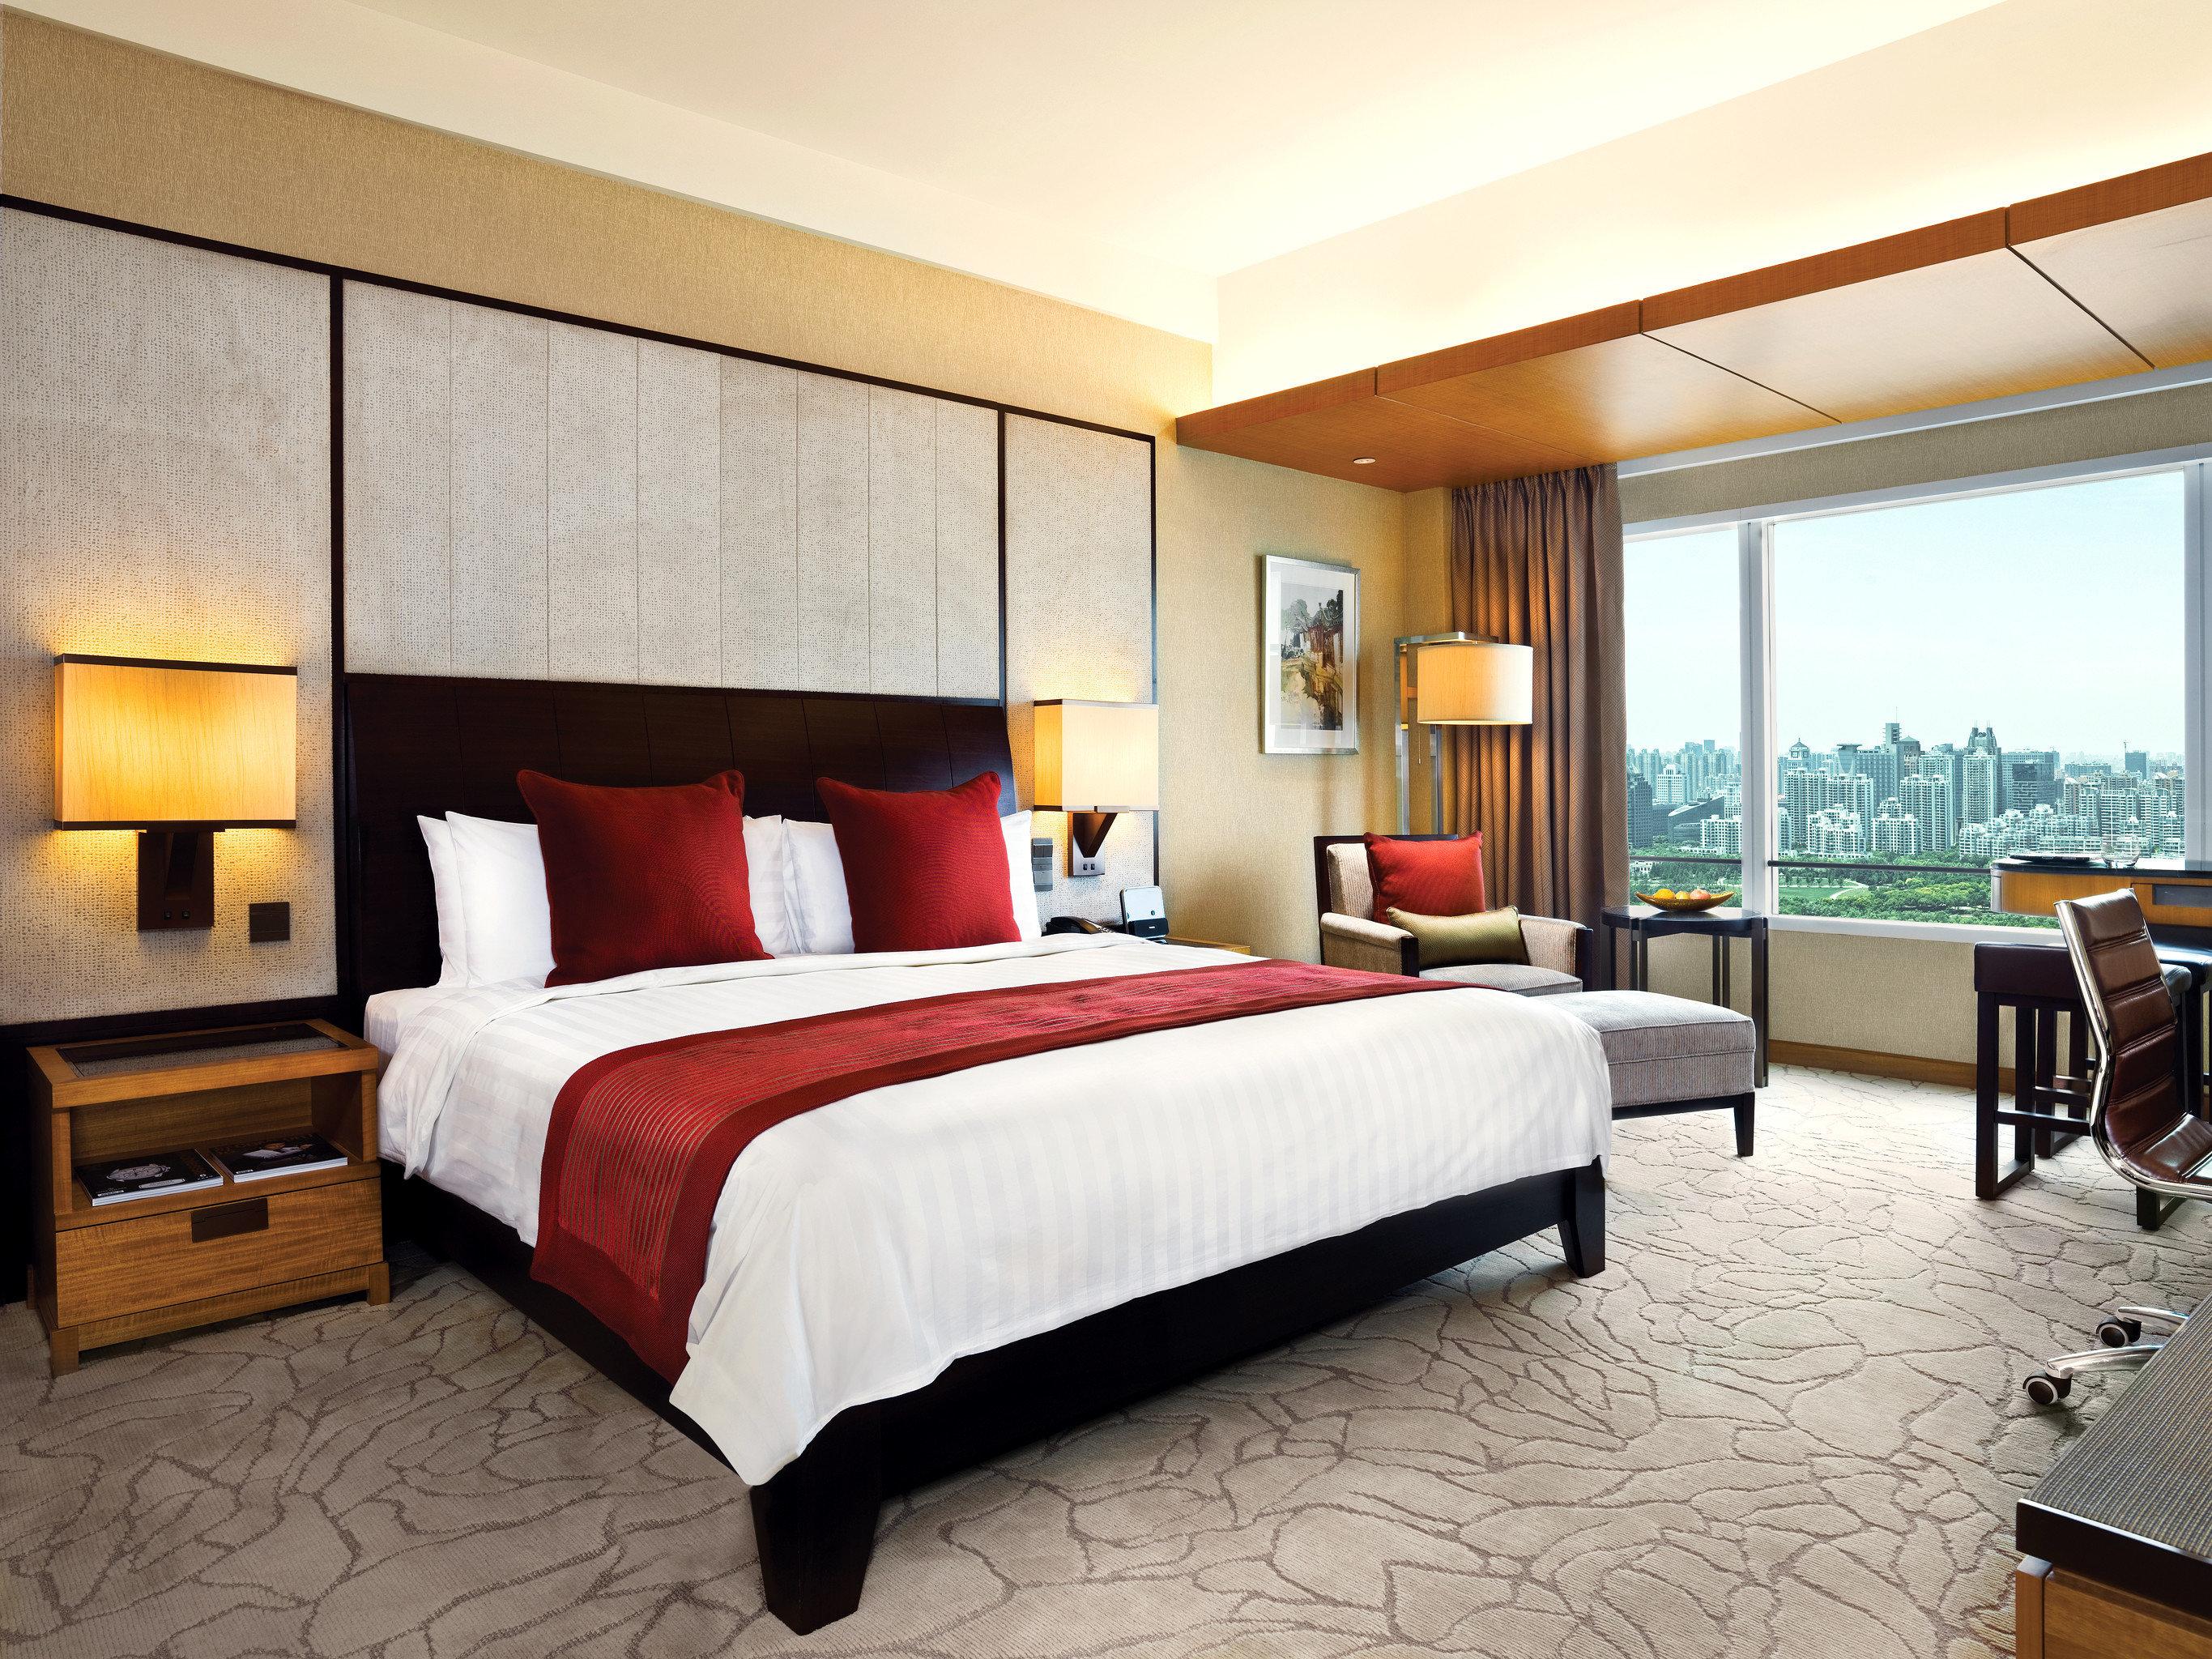 Bedroom Modern Scenic views Suite property hardwood living room condominium bed sheet